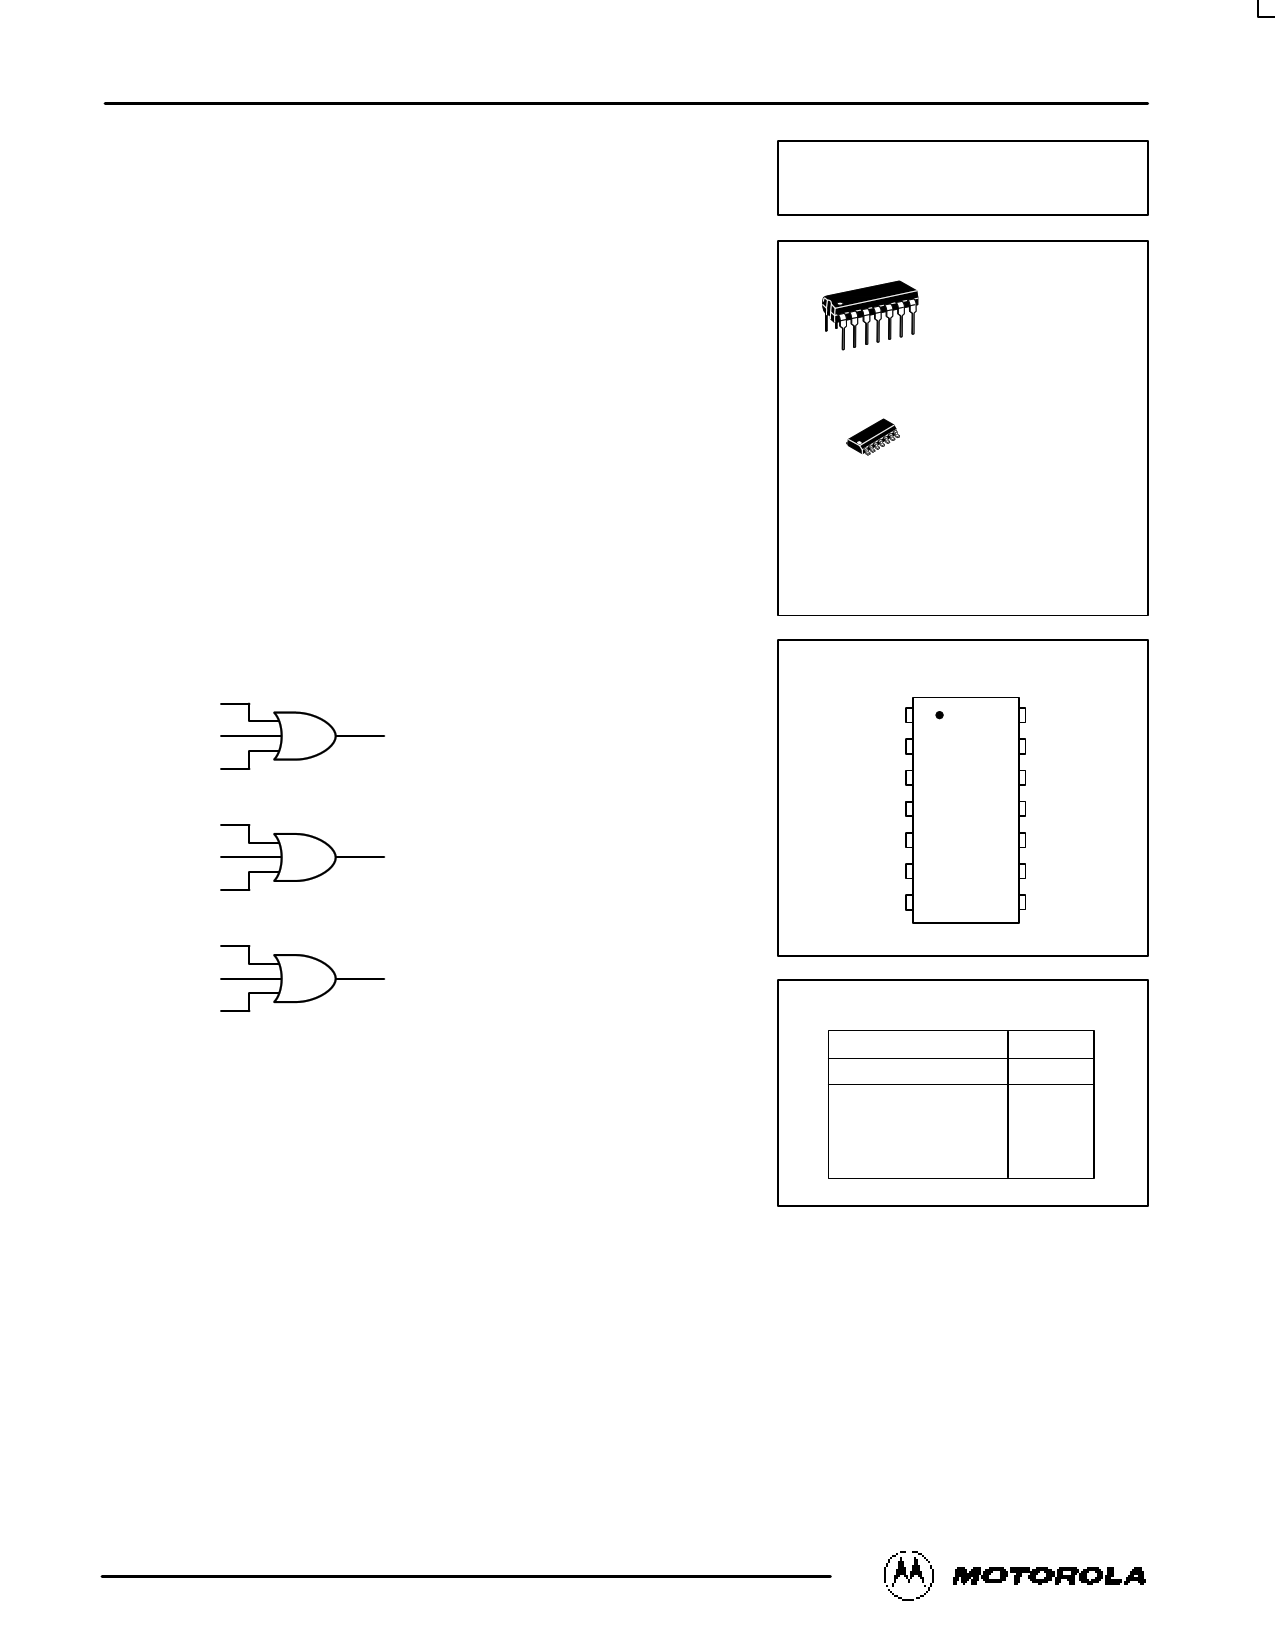 74hc4075 datasheet